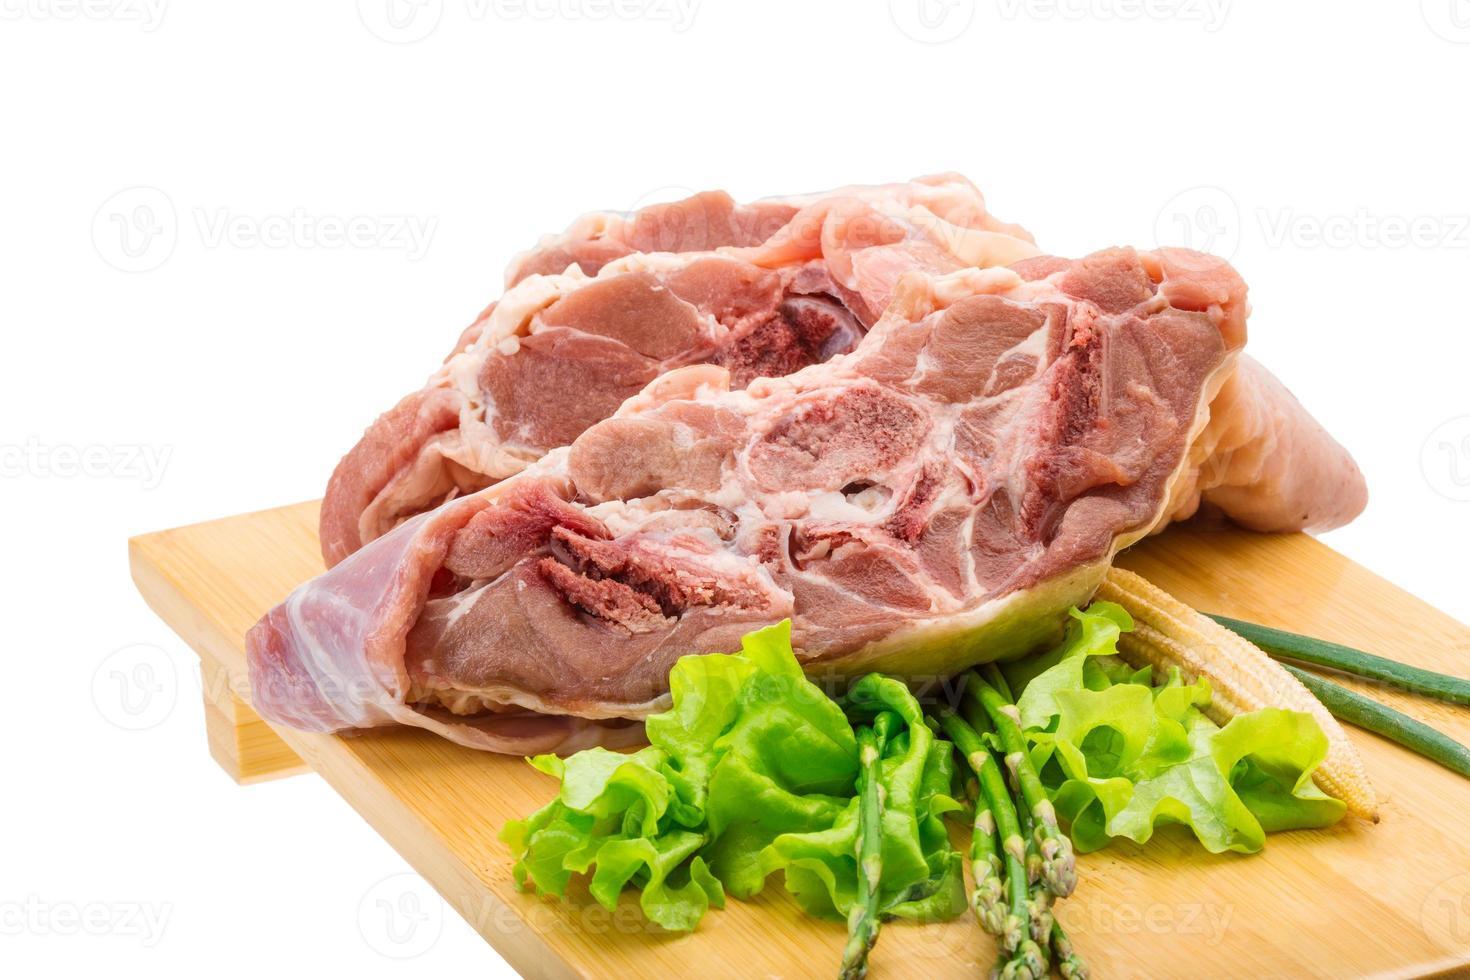 Raw lamb photo